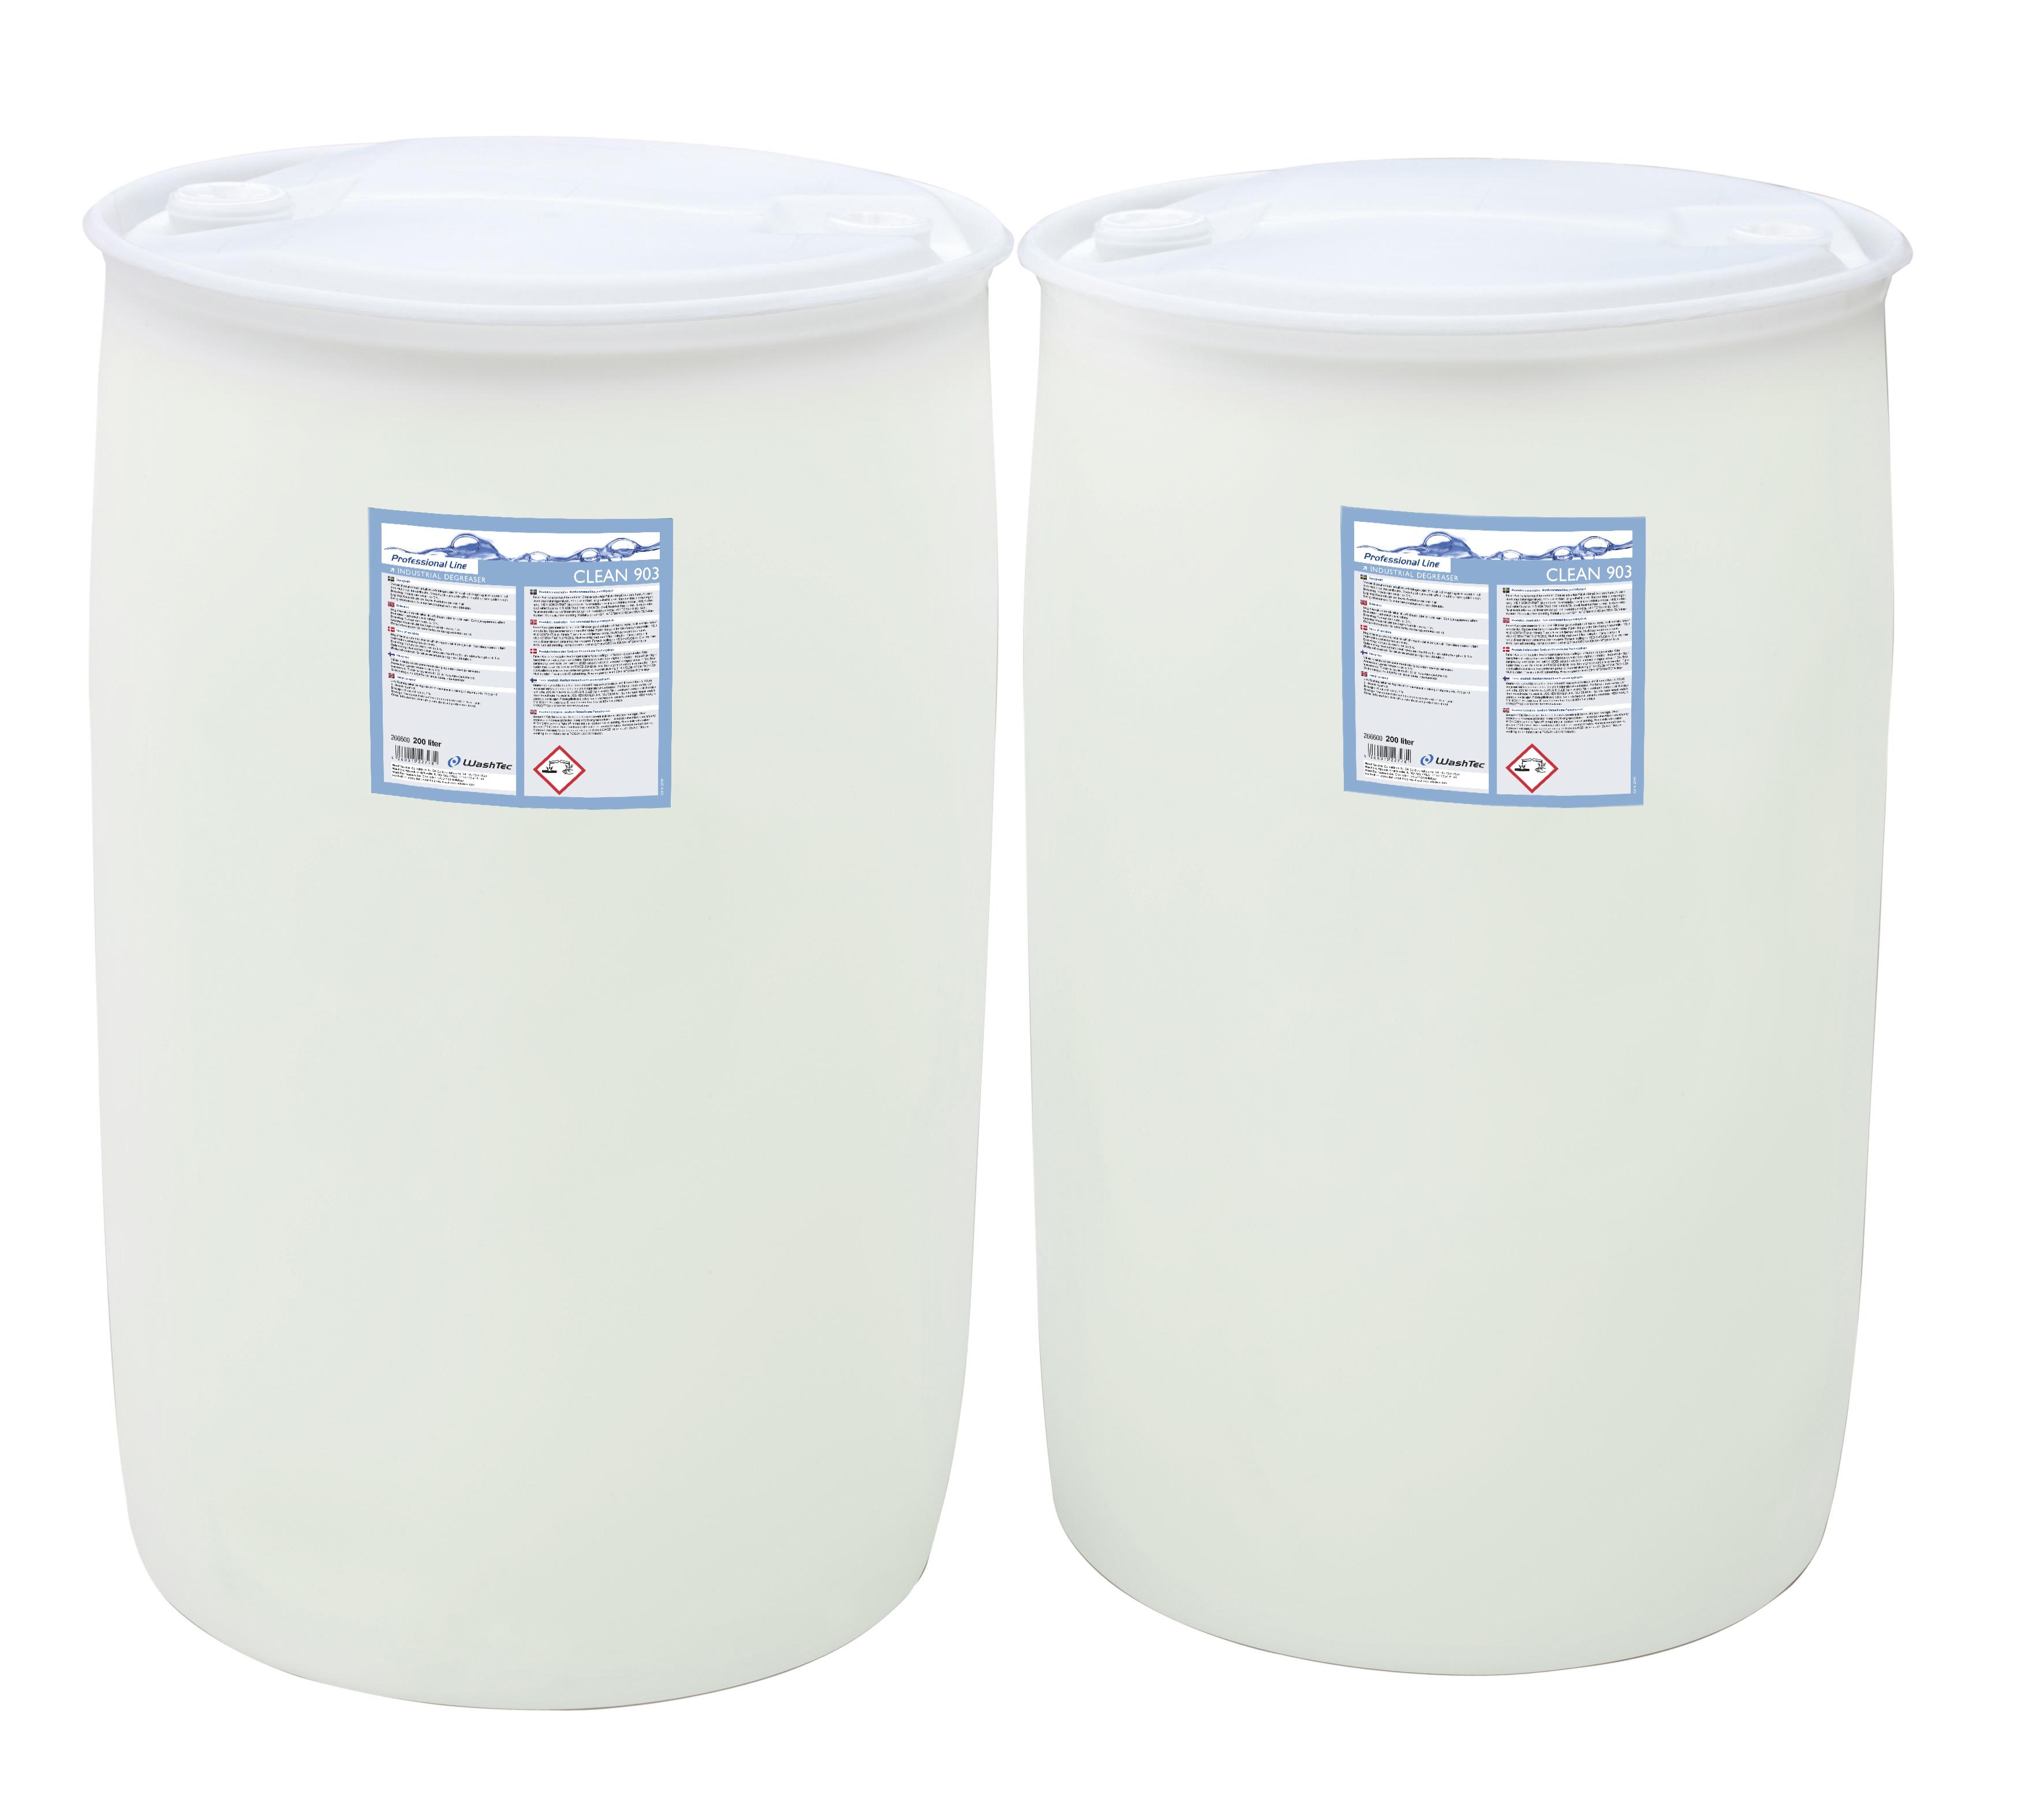 CLEAN 903 - Industrial degrea 200L